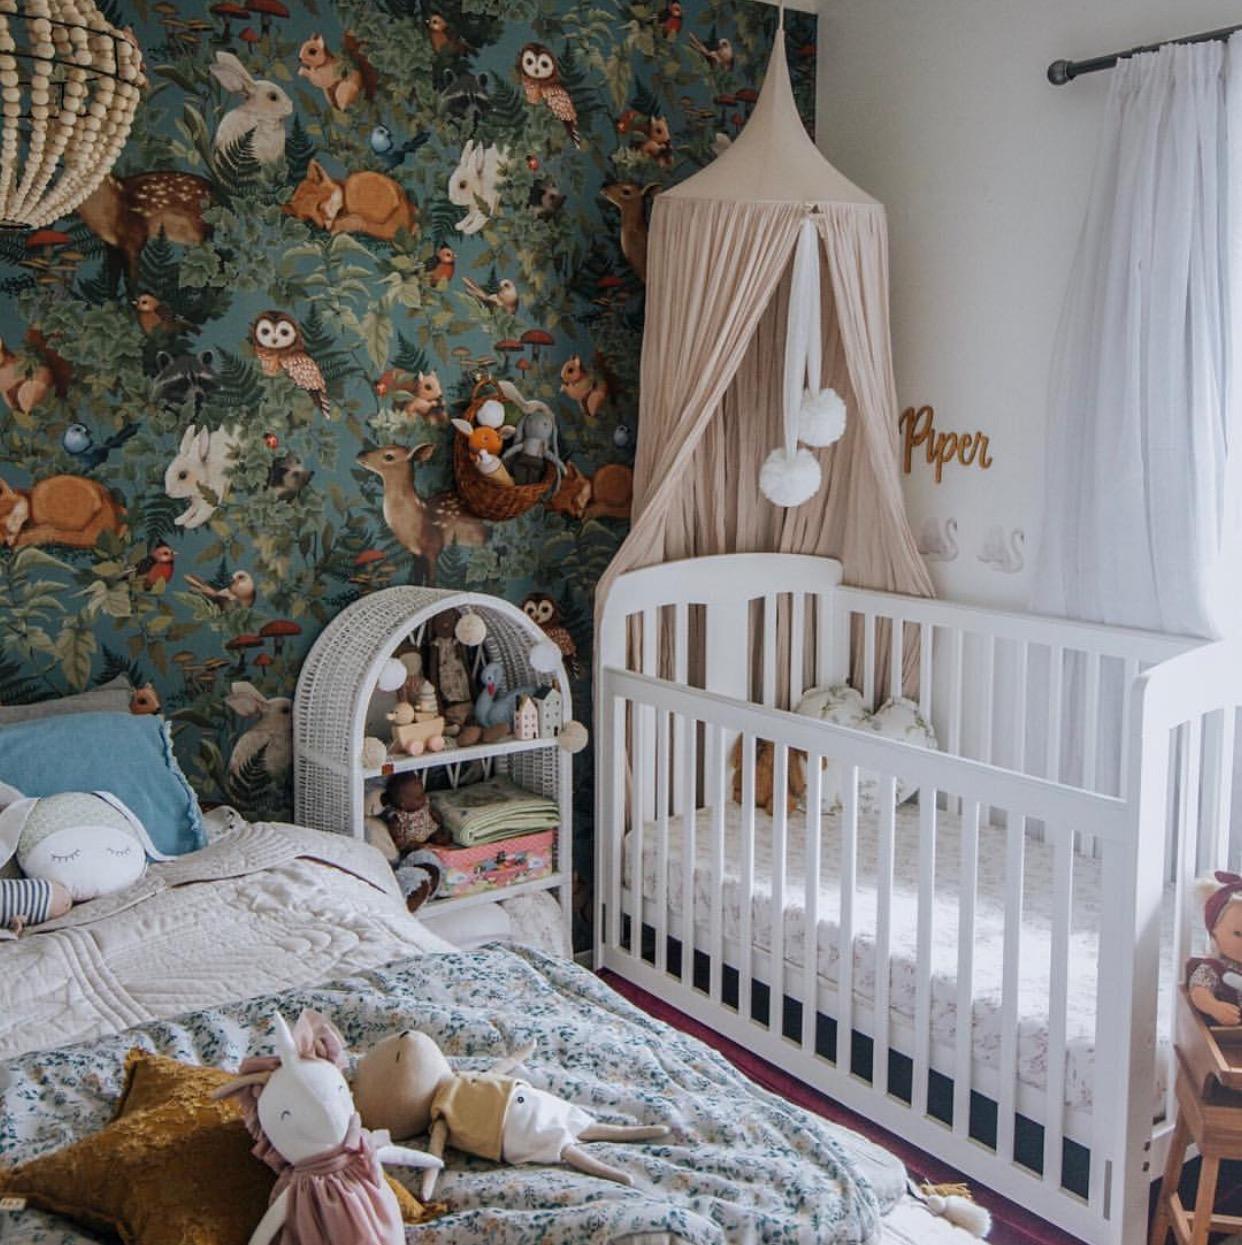 Make a tiny bedroom feel and work like a big bedroom  Stuff.co.nz - 01 August 2018